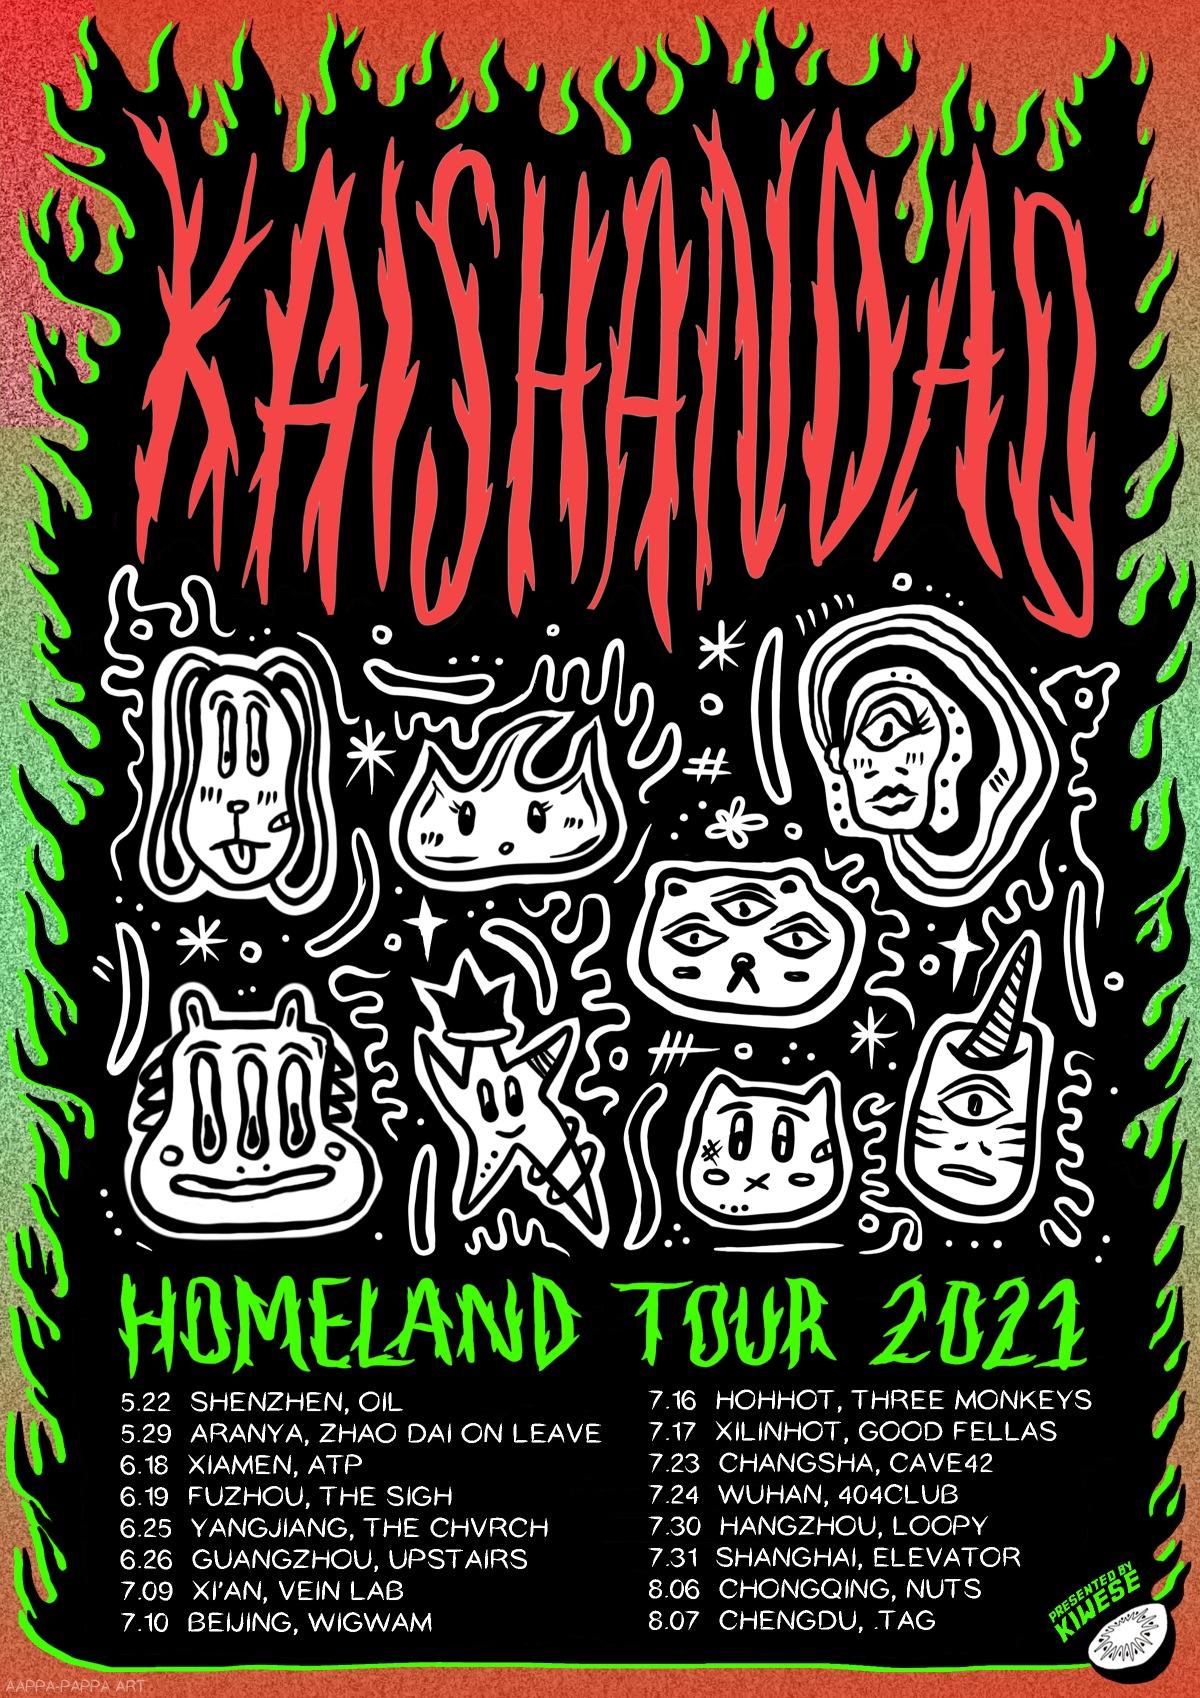 Kaishandao Homeland Tour POSTER Full